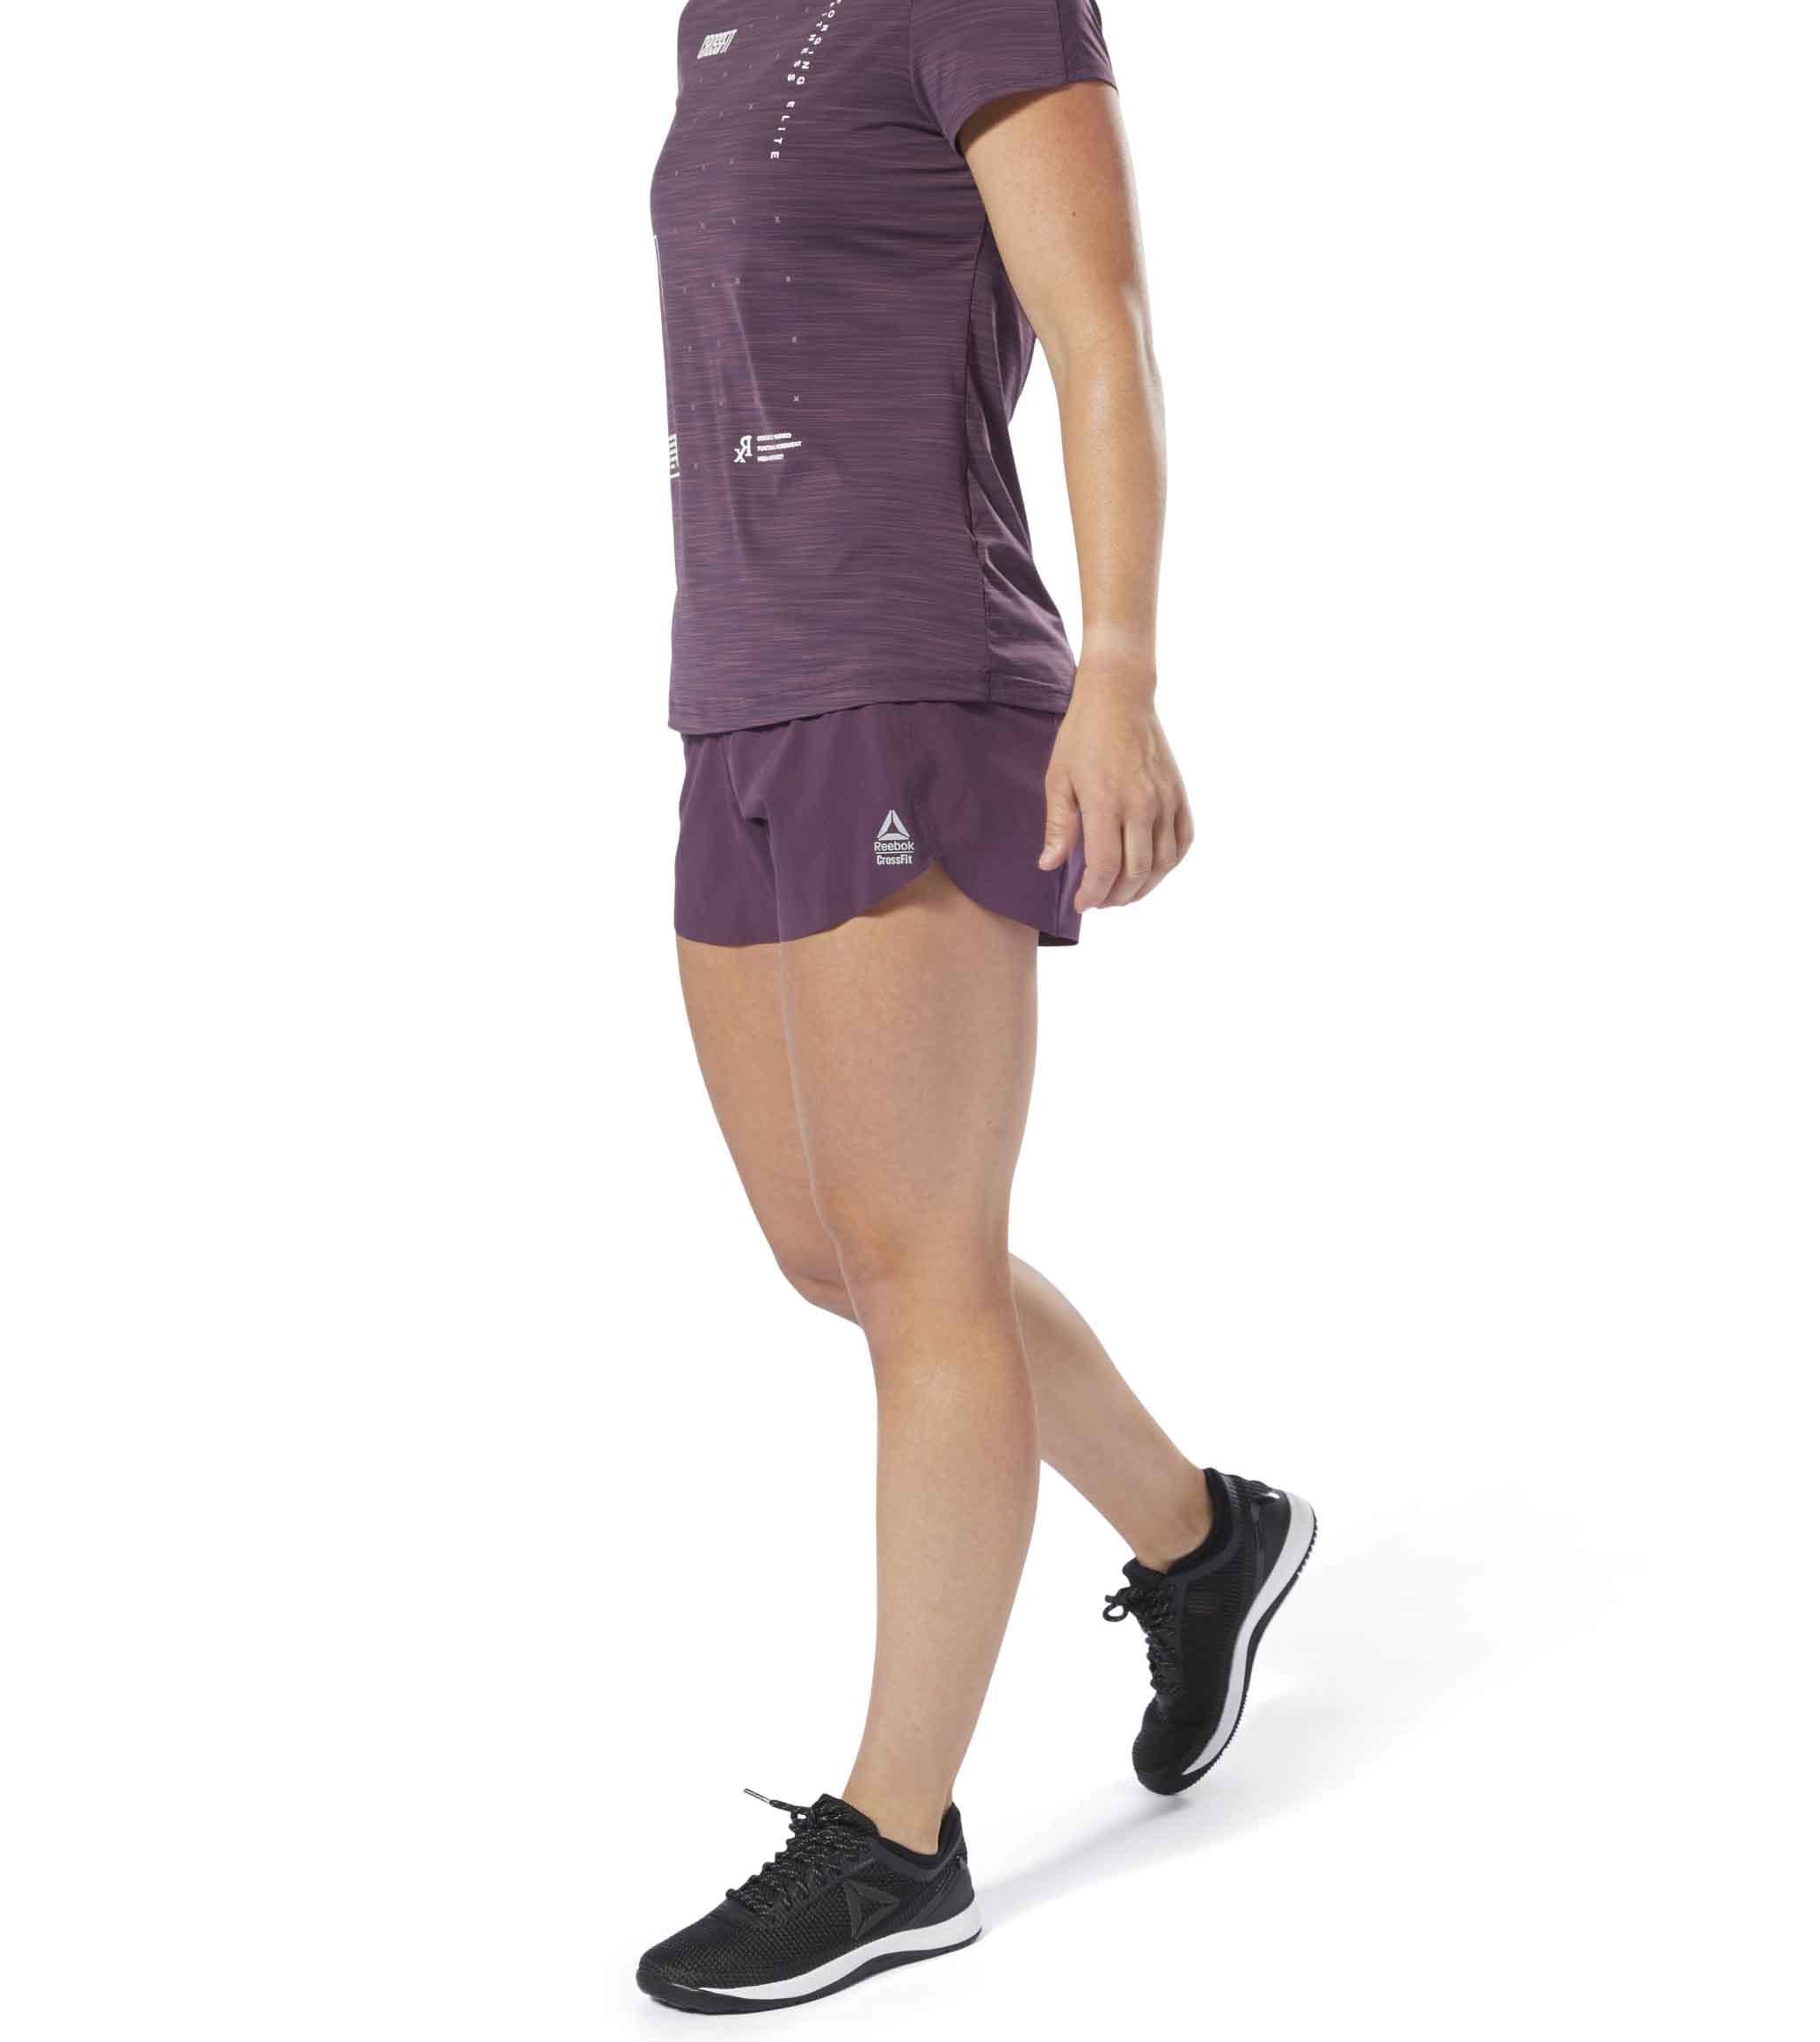 crossfit-shorts-knit-waistband-2